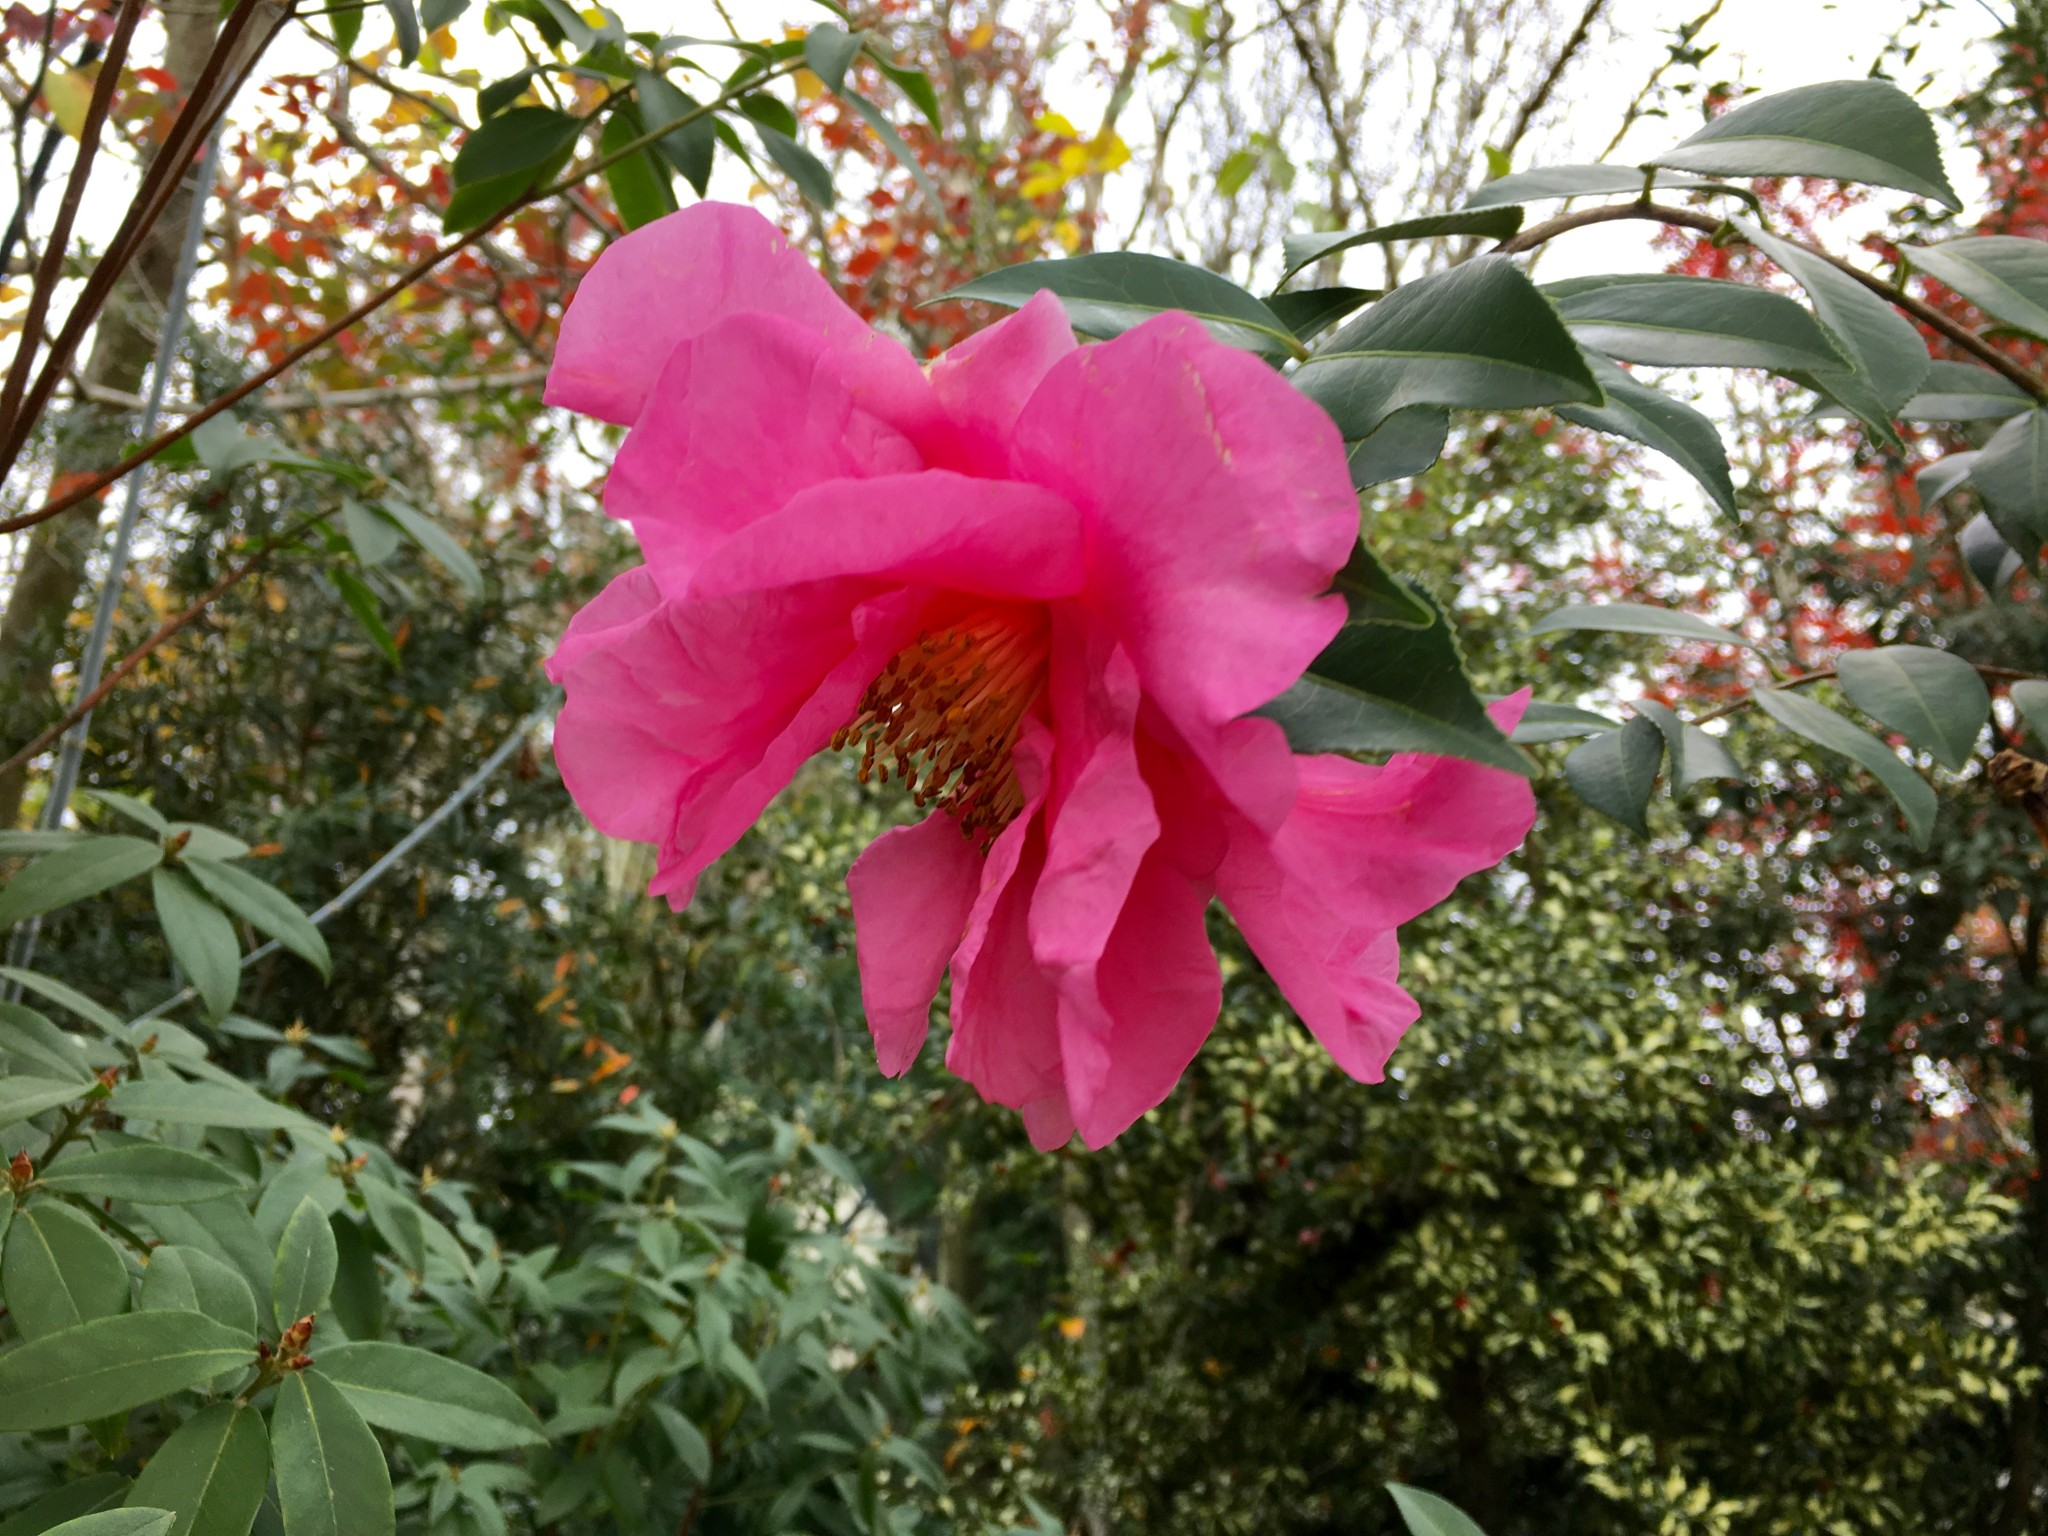 Camellia NOID. Crazy gorgeous, right?